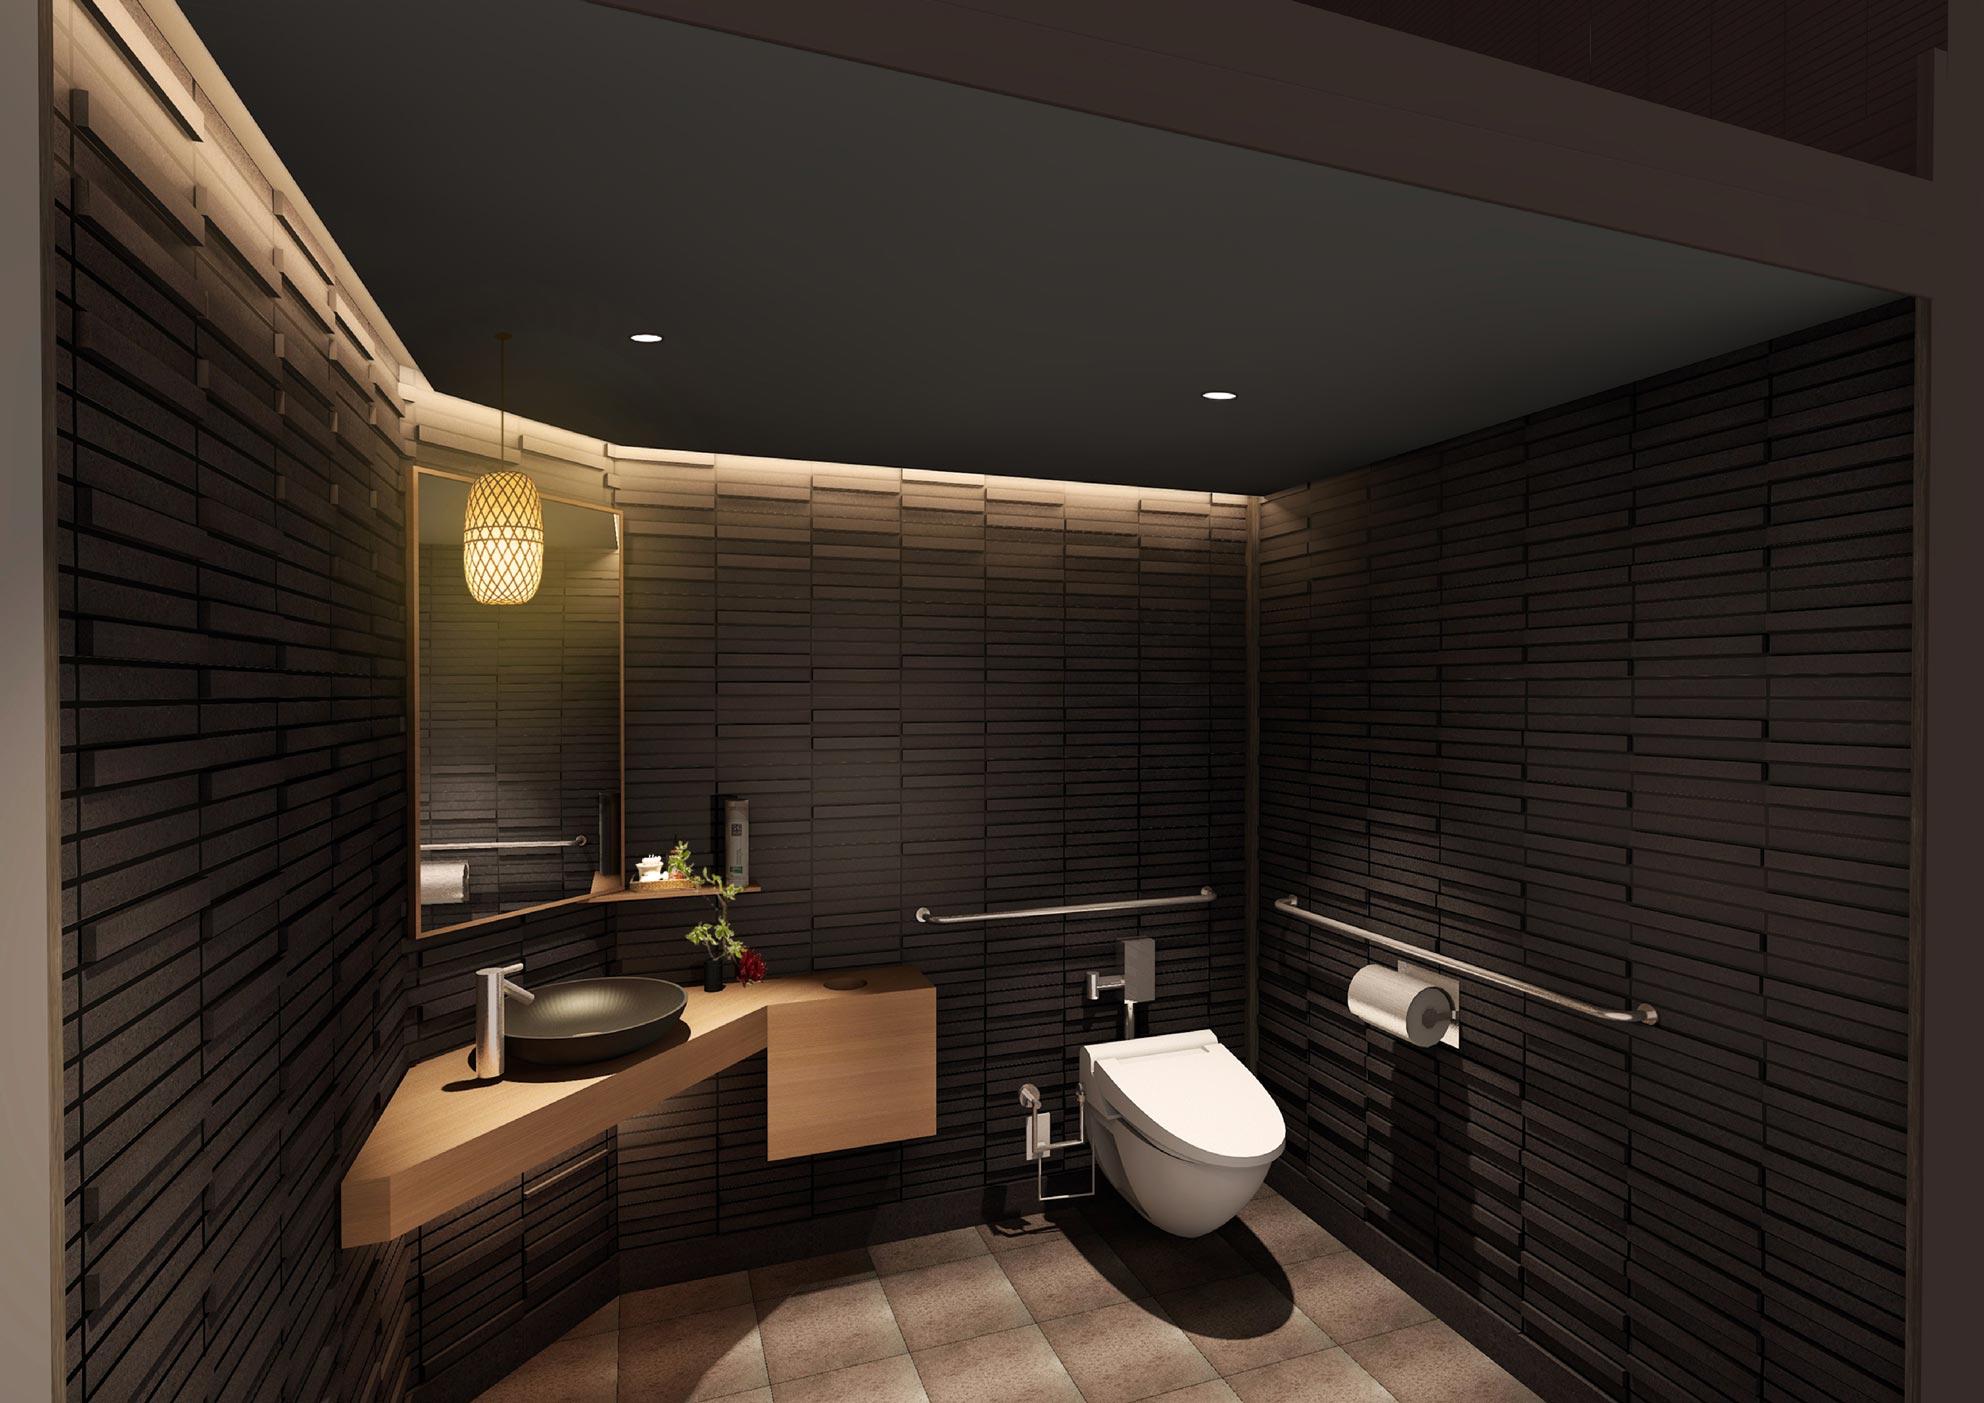 FutagoNY_toilet